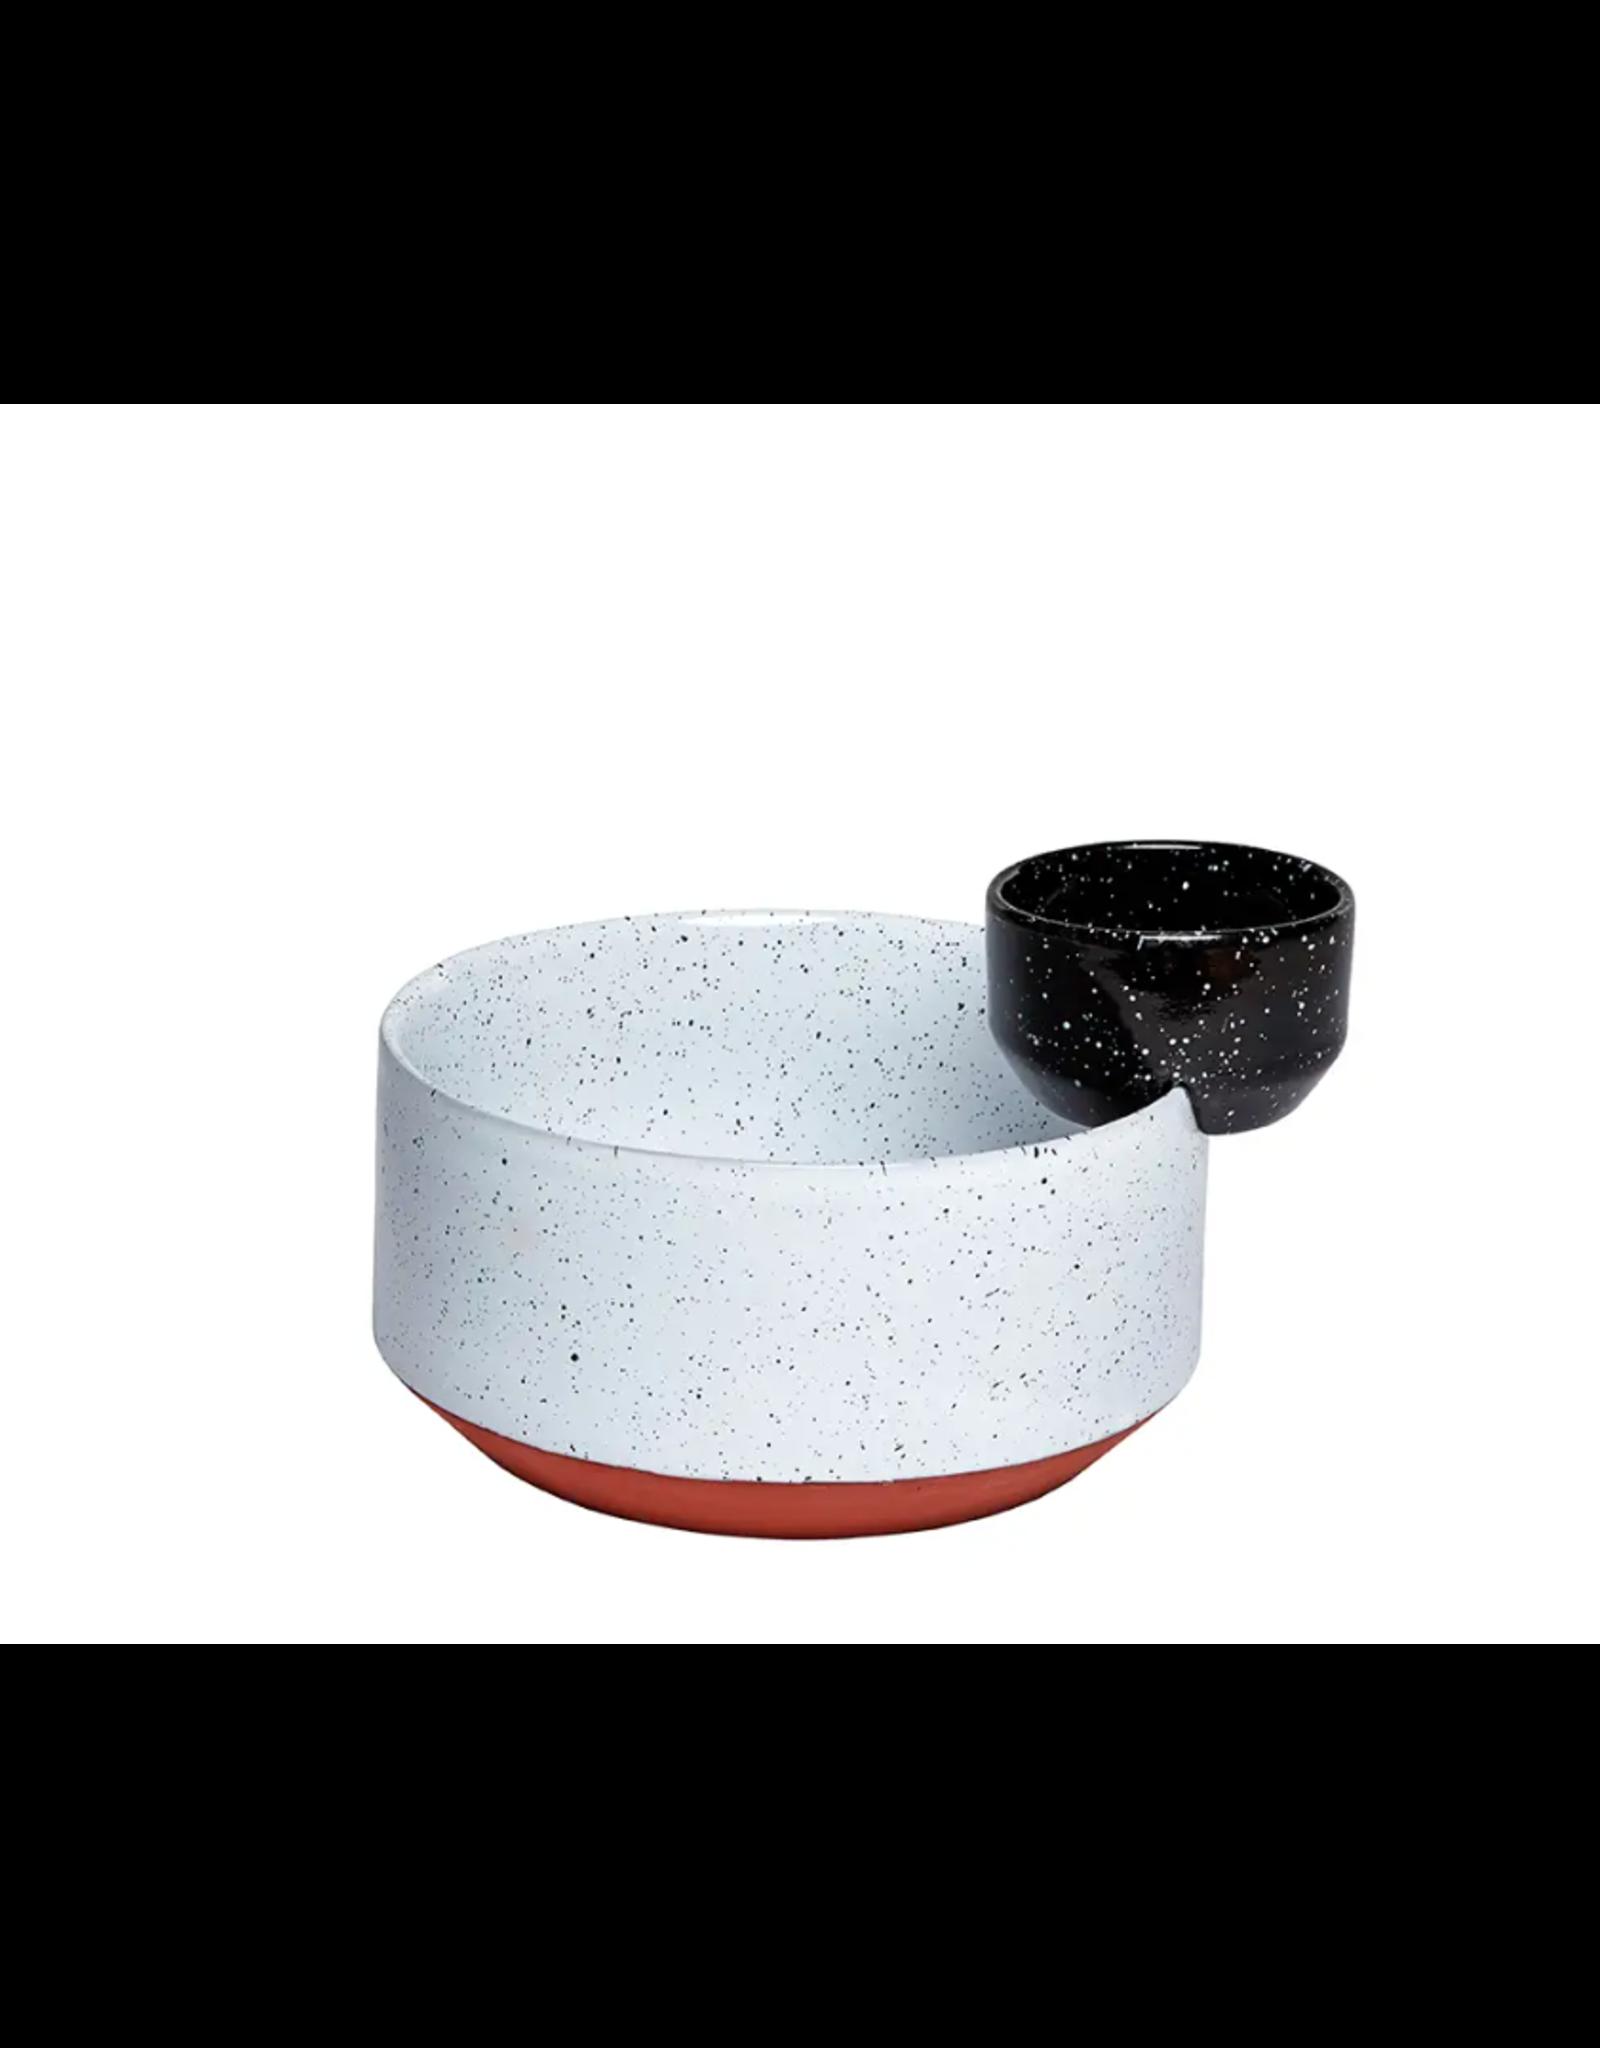 Doiy Eclipse Chip + Dip Serving Bowl